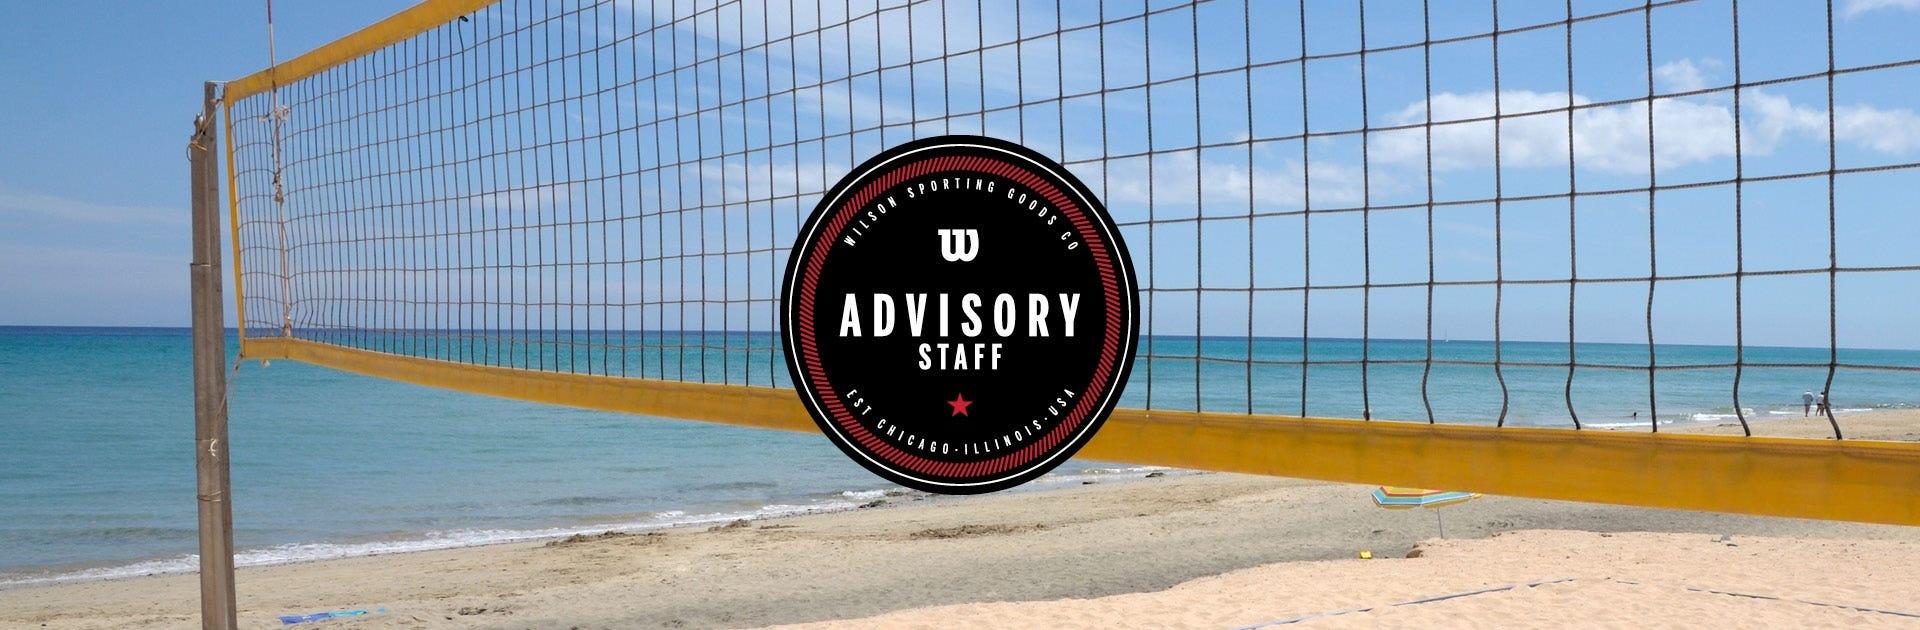 Wilson Volleyball Advisory Staff - NCAA Beach